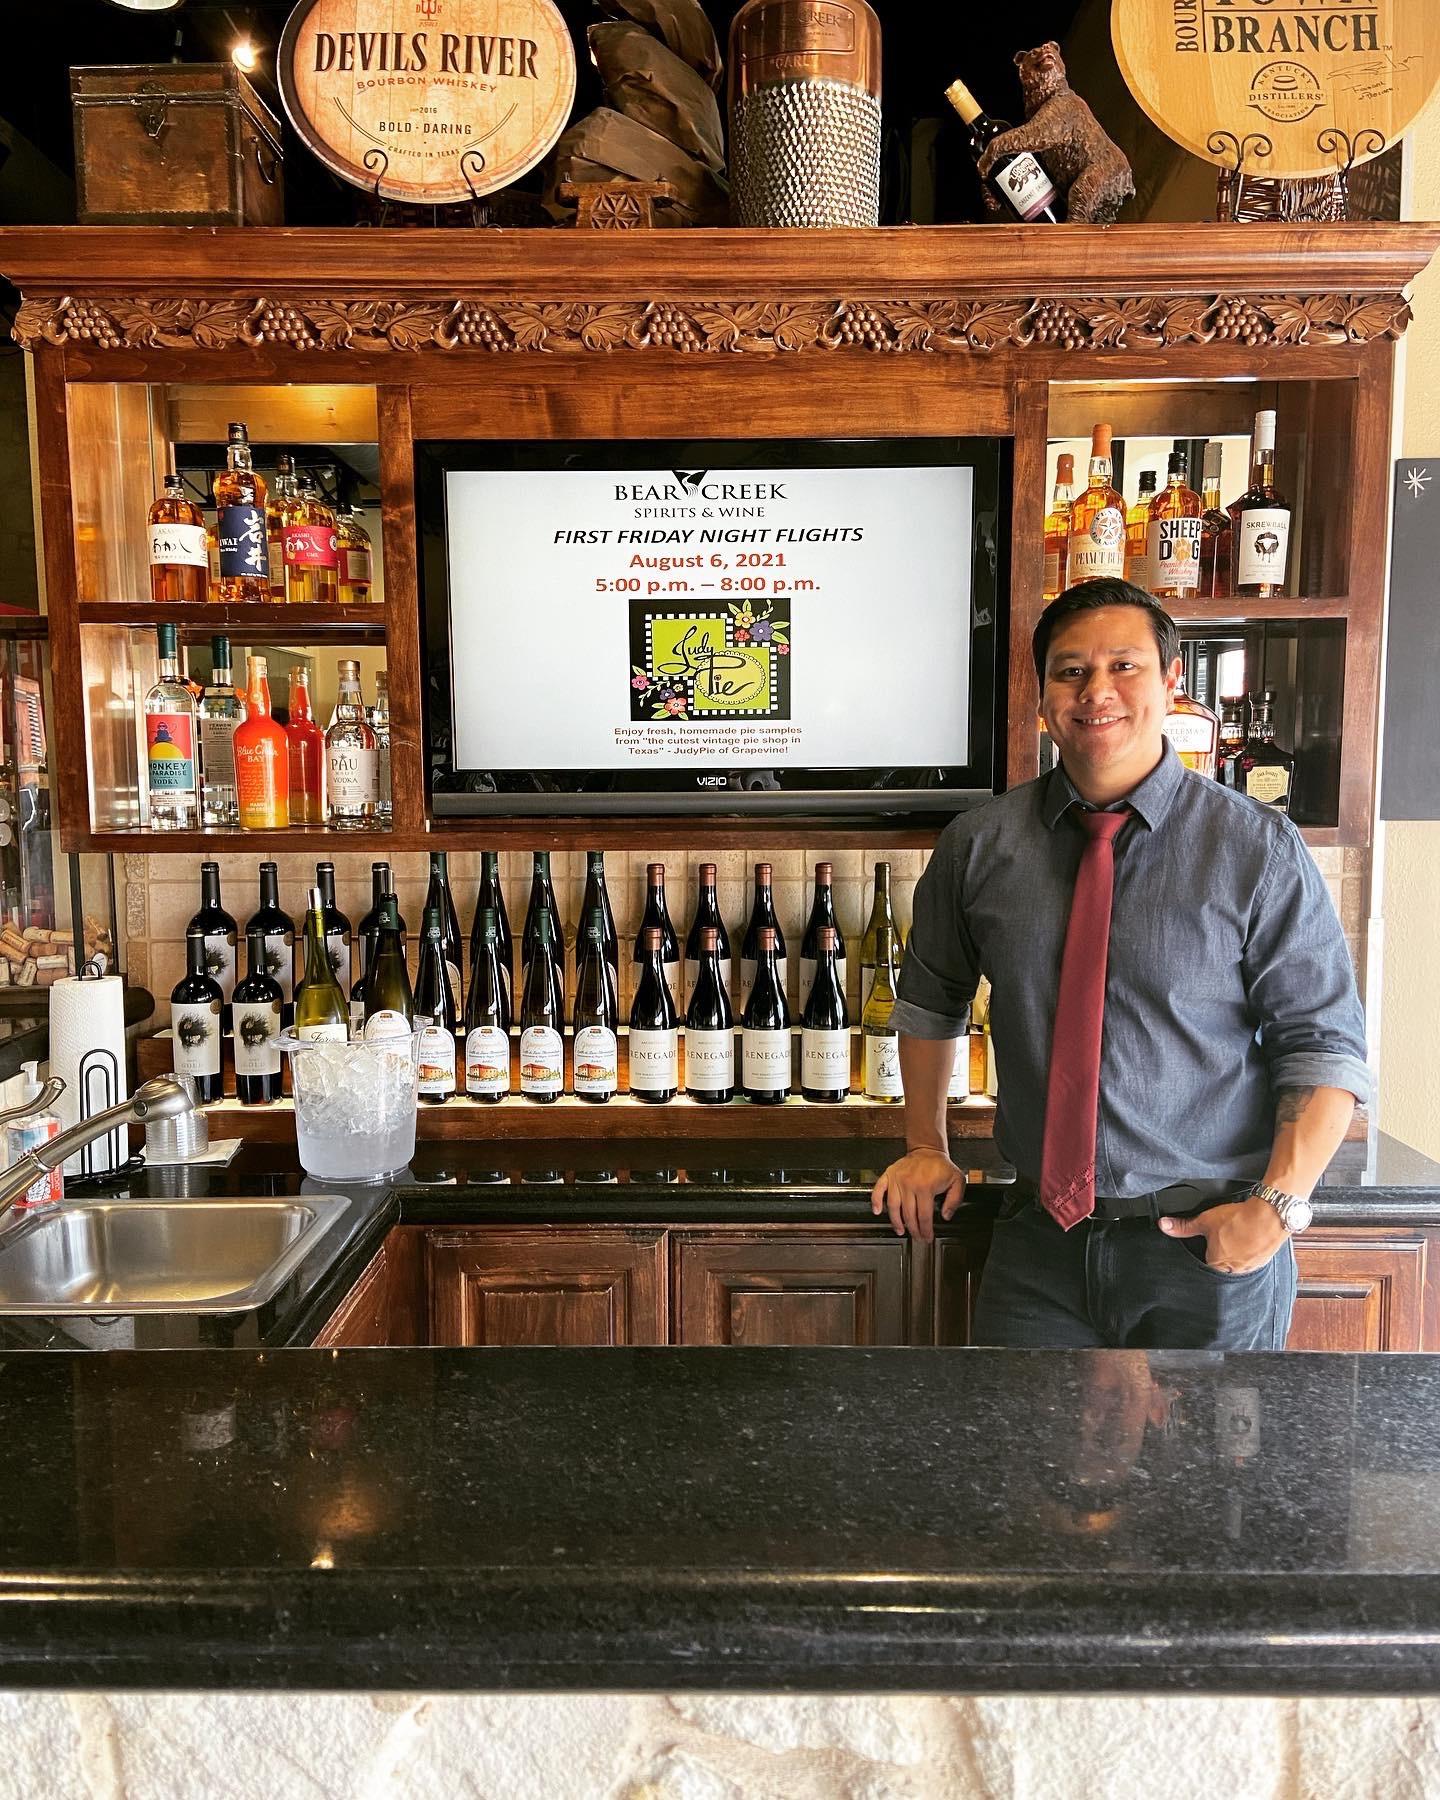 Portrait of Bearcreek Spirits & Wine